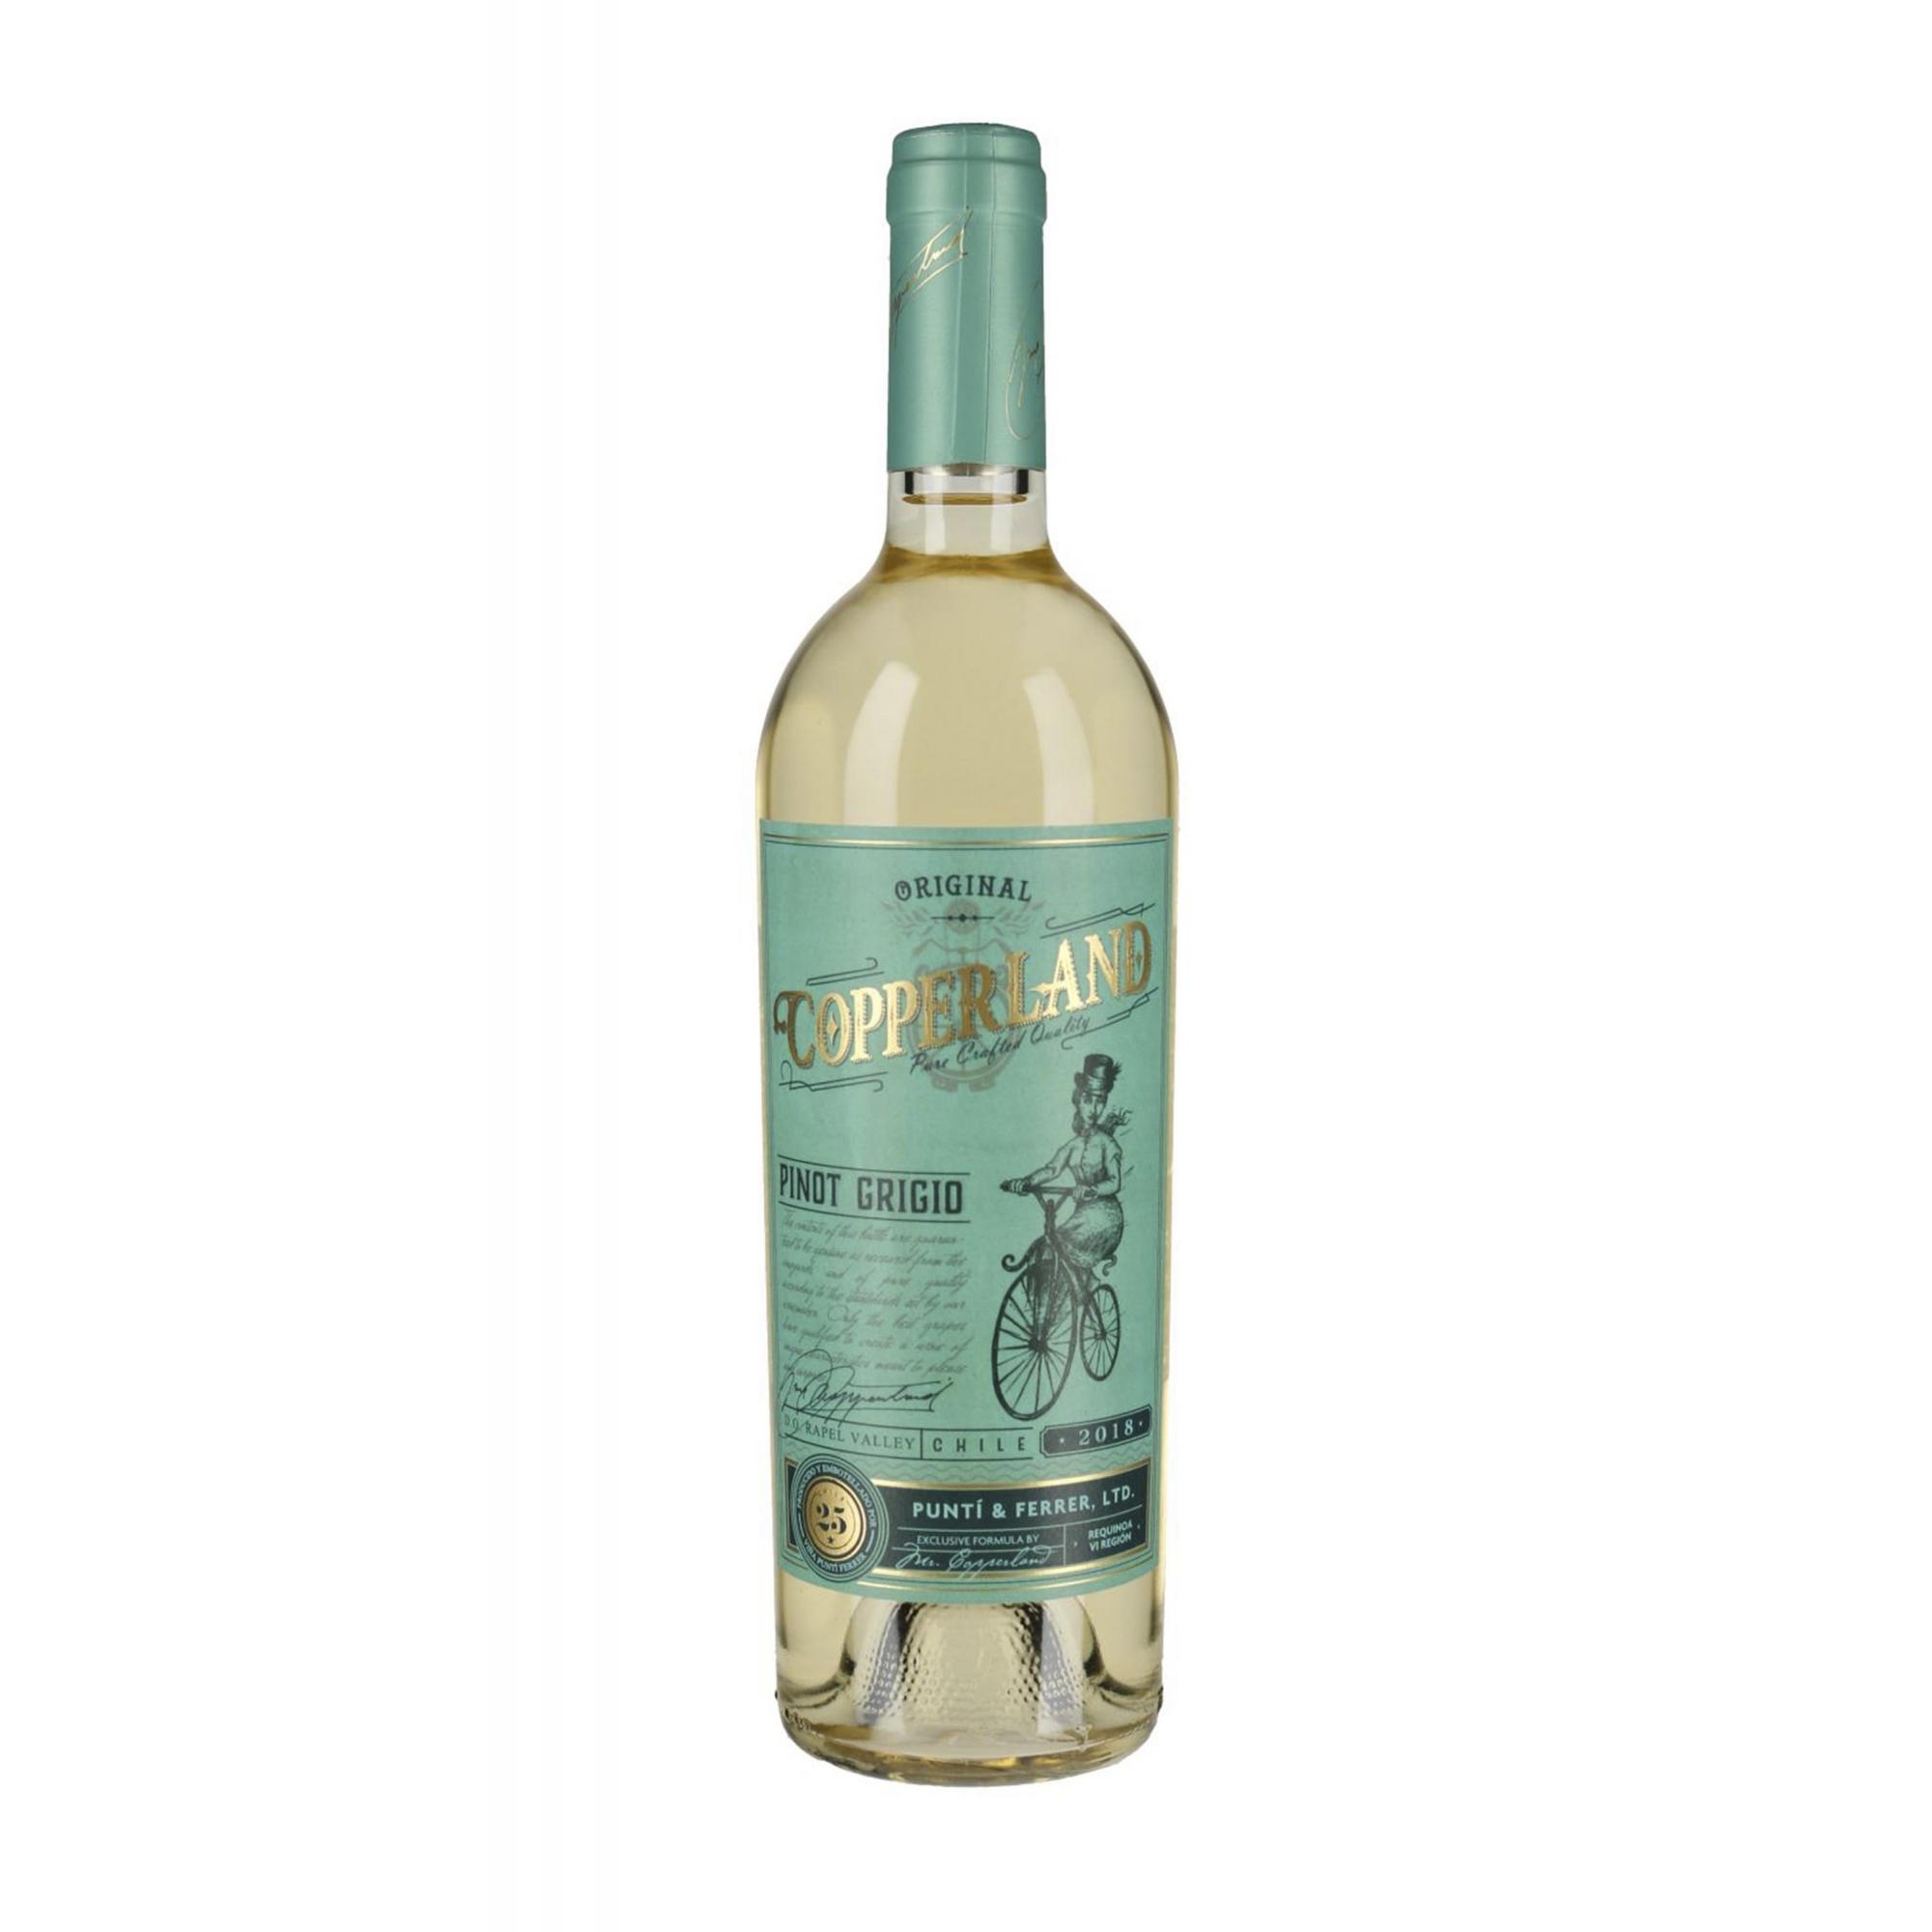 Vinho Branco Copperland Pinot Grigio 750ml